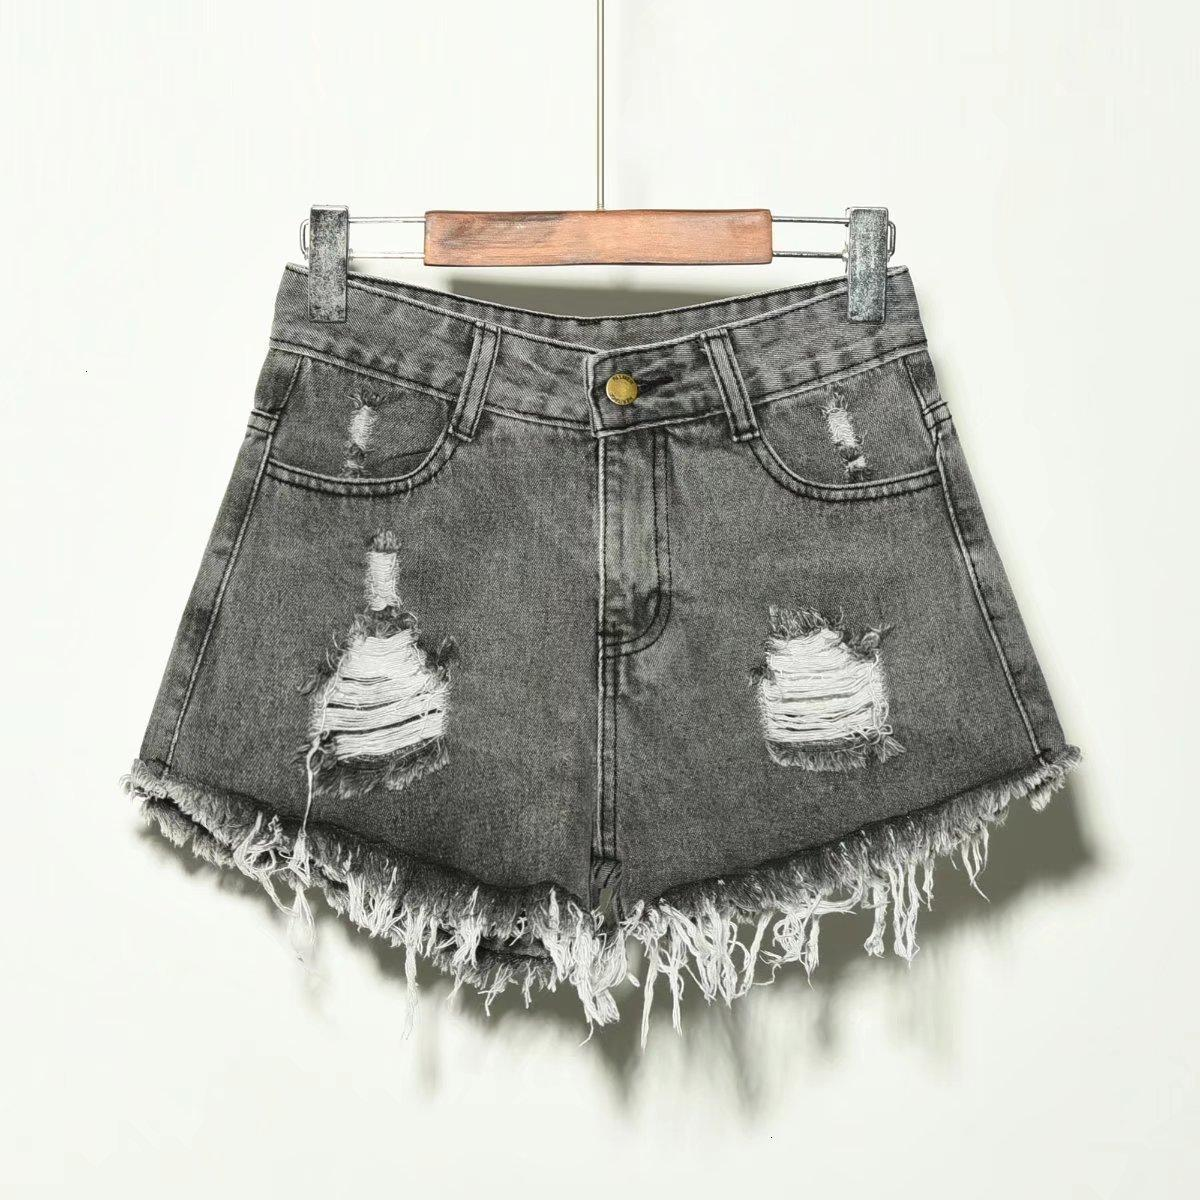 Jeans Summer Hole Light Blue Women's Fat MM MM di grandi dimensioni Denim Elastic Denim Donne Trendy Donne